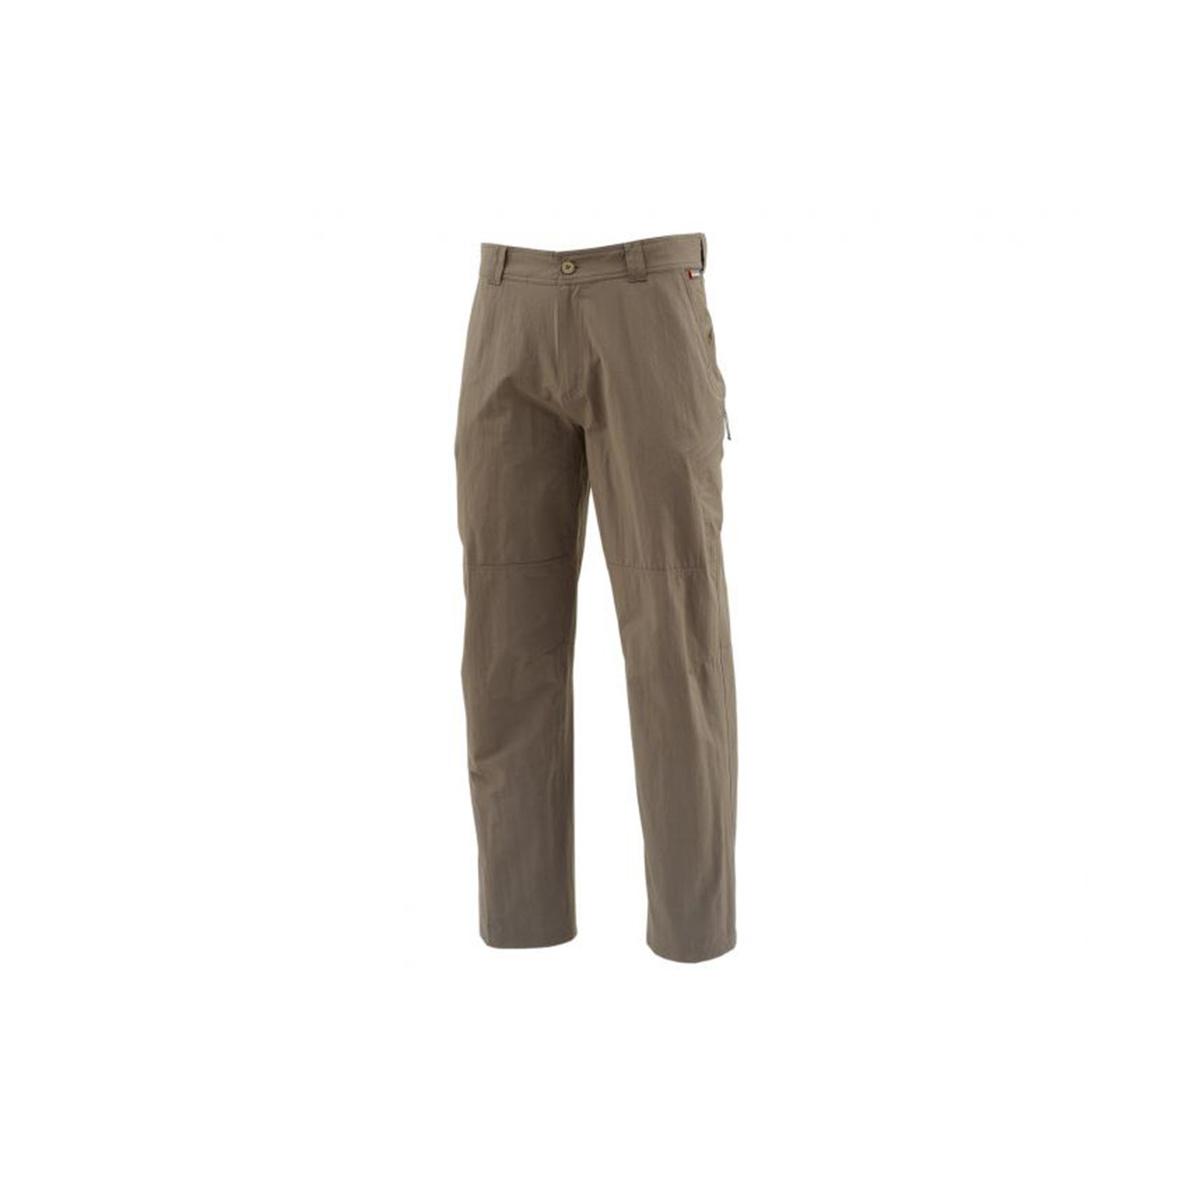 Simms Clothing Men's Guide Pant